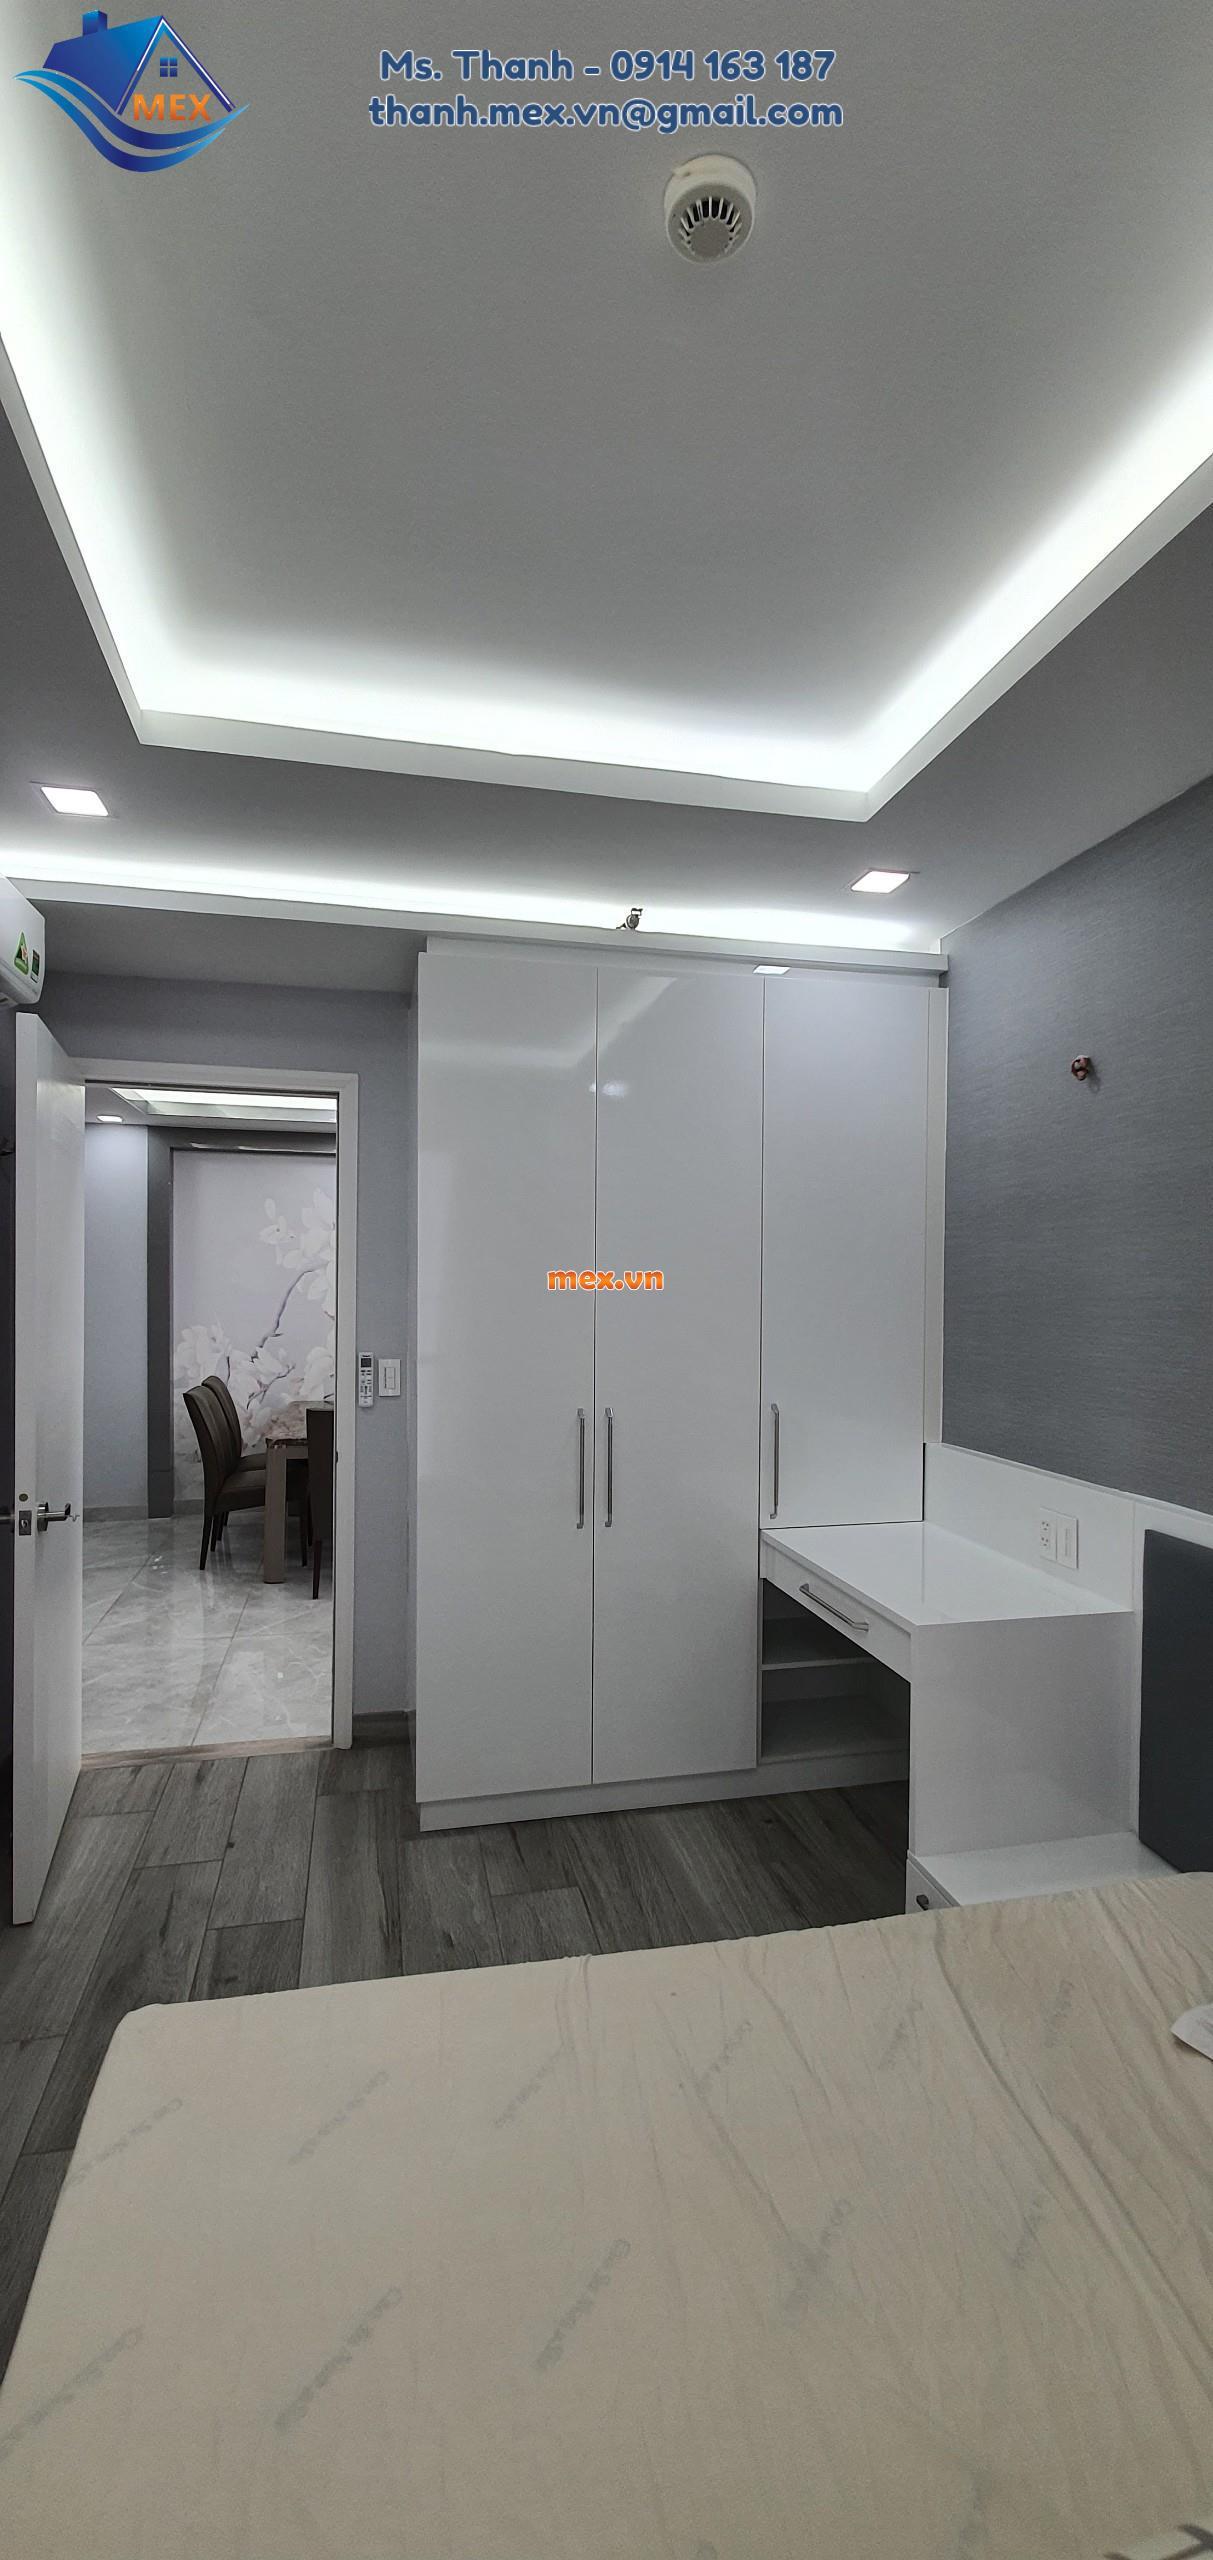 drawing-room